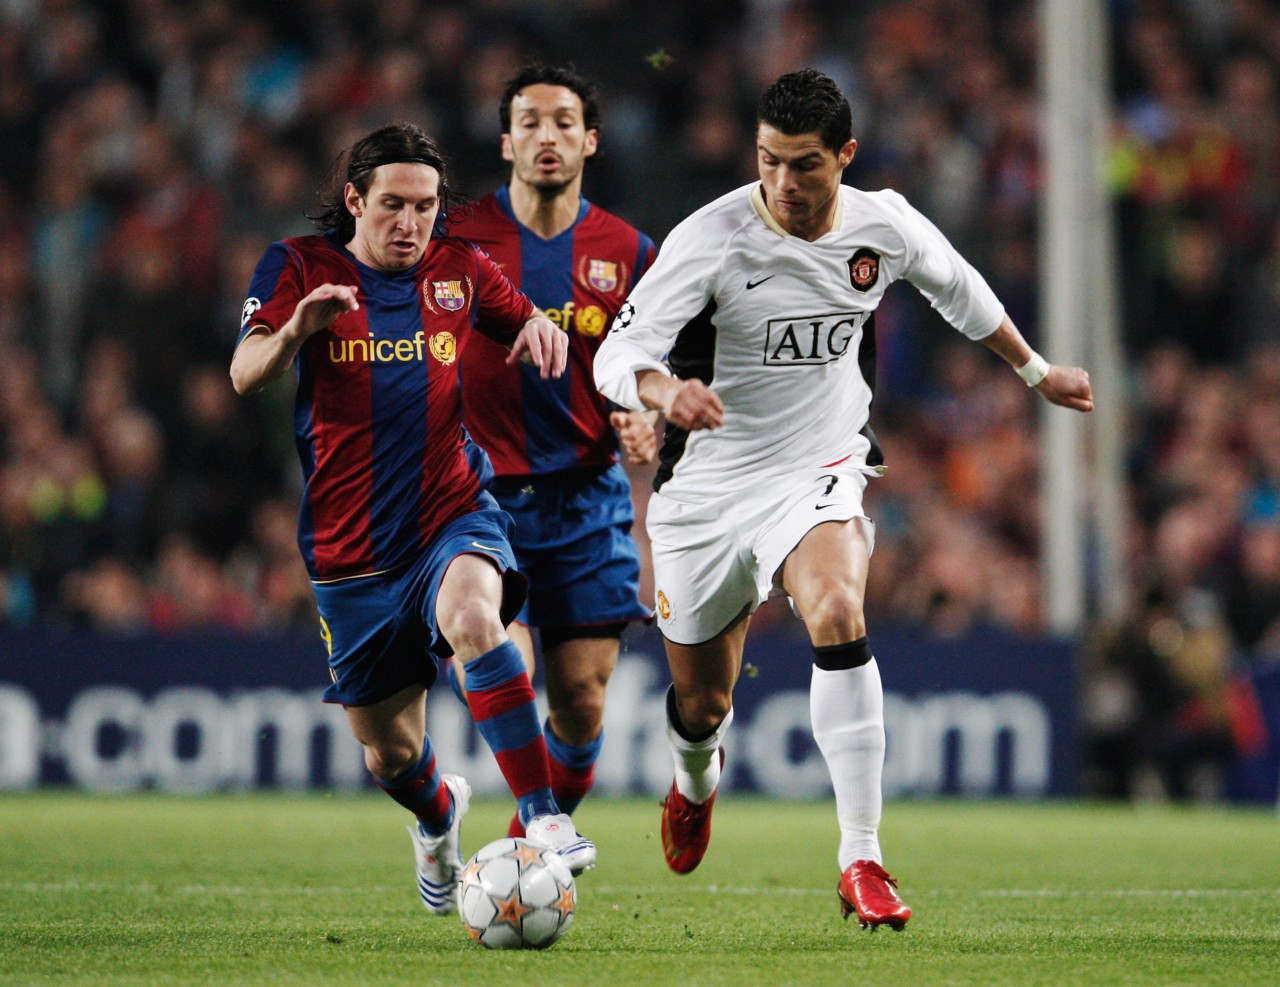 Barcelona 0 x 0 Manchester United - Jasper Juinen/Getty Images